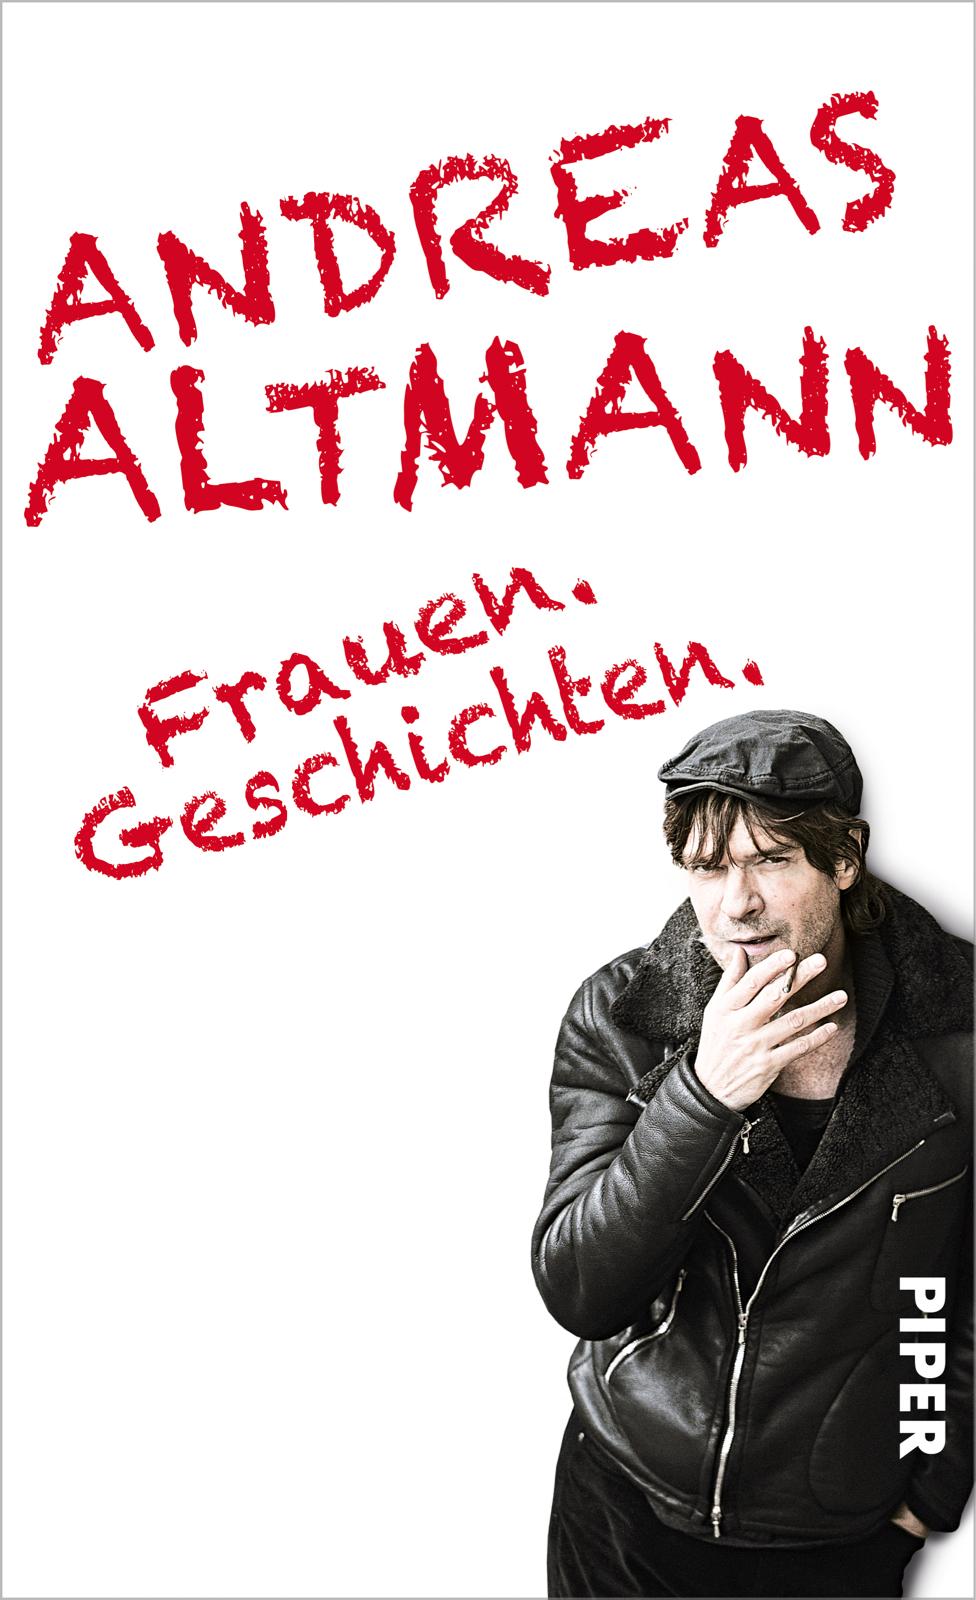 Frauen.Geschichten. Andreas Altmann 336 Seiten ISBN 978 3492055888 Piper Verlag